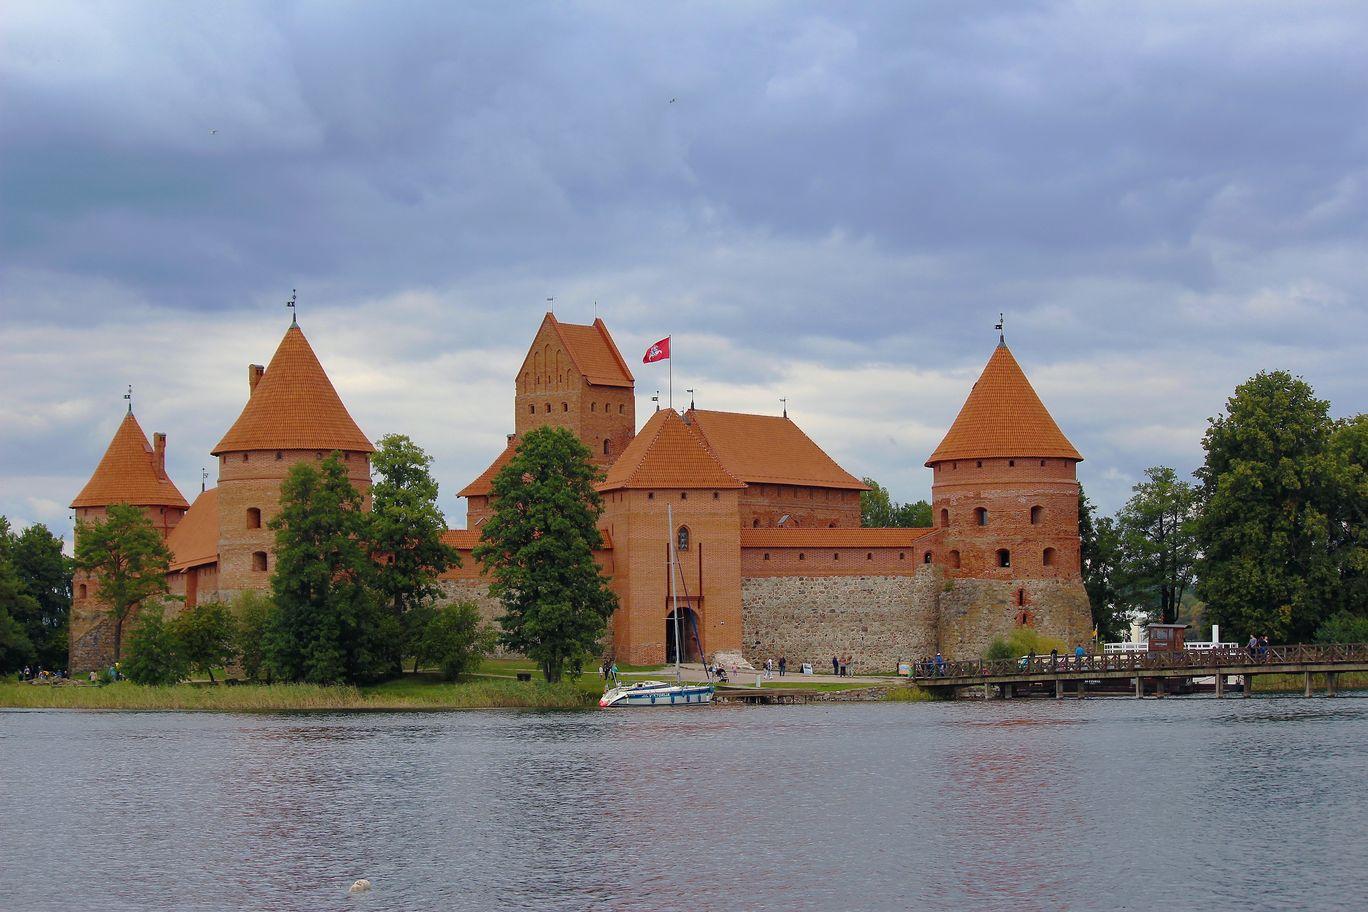 Photo of Trakai By Oindrila Soni